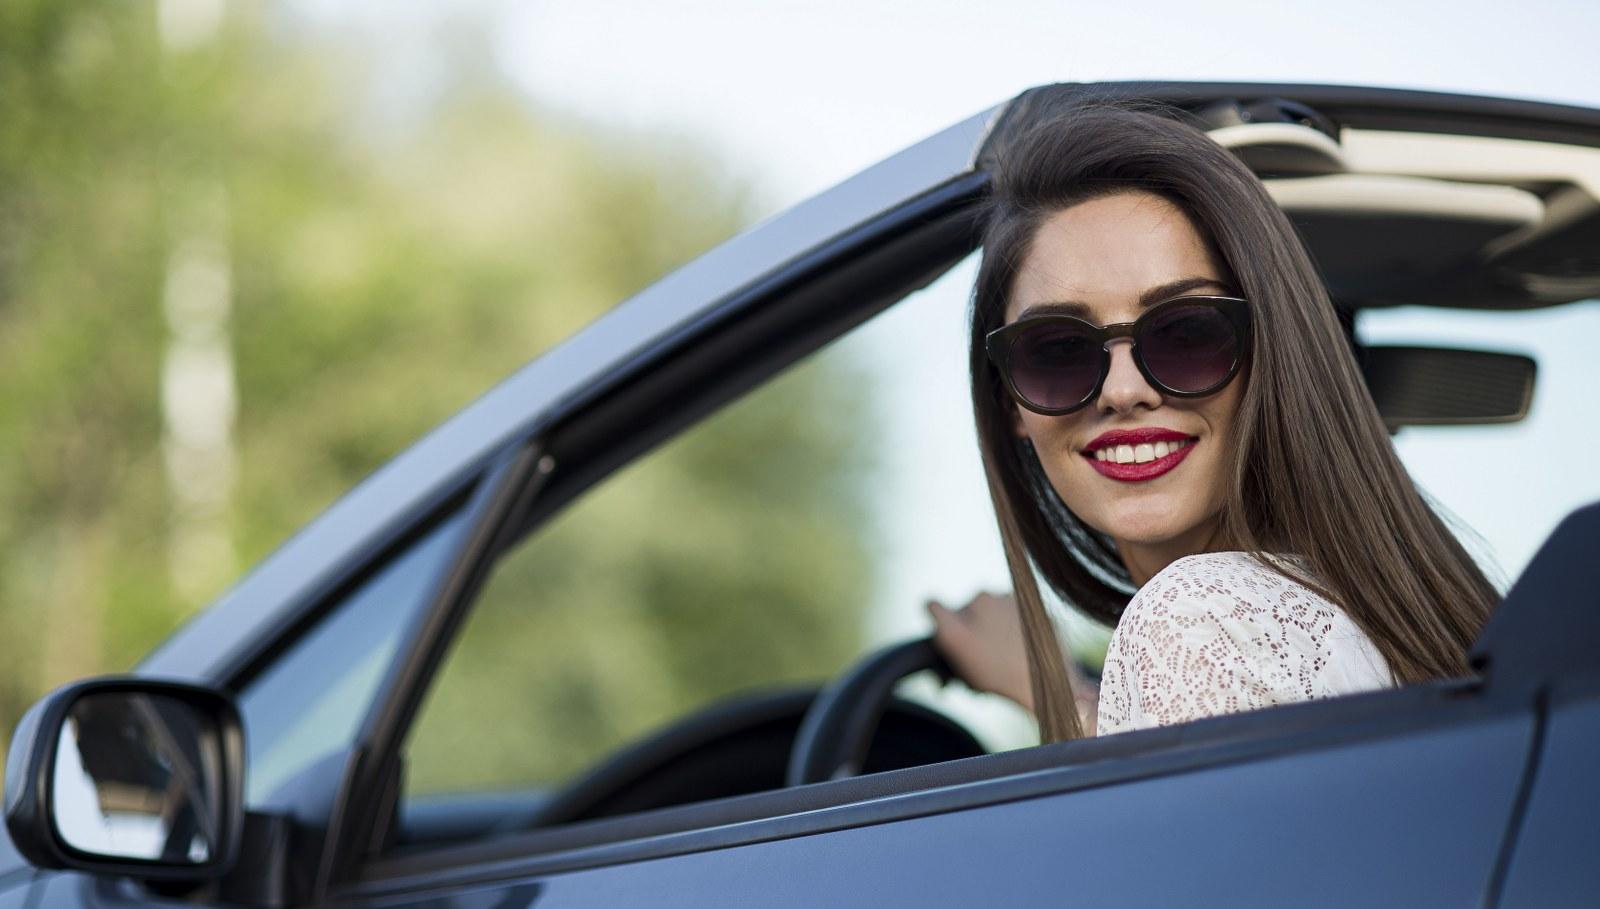 De ce unele fete nu au jeep